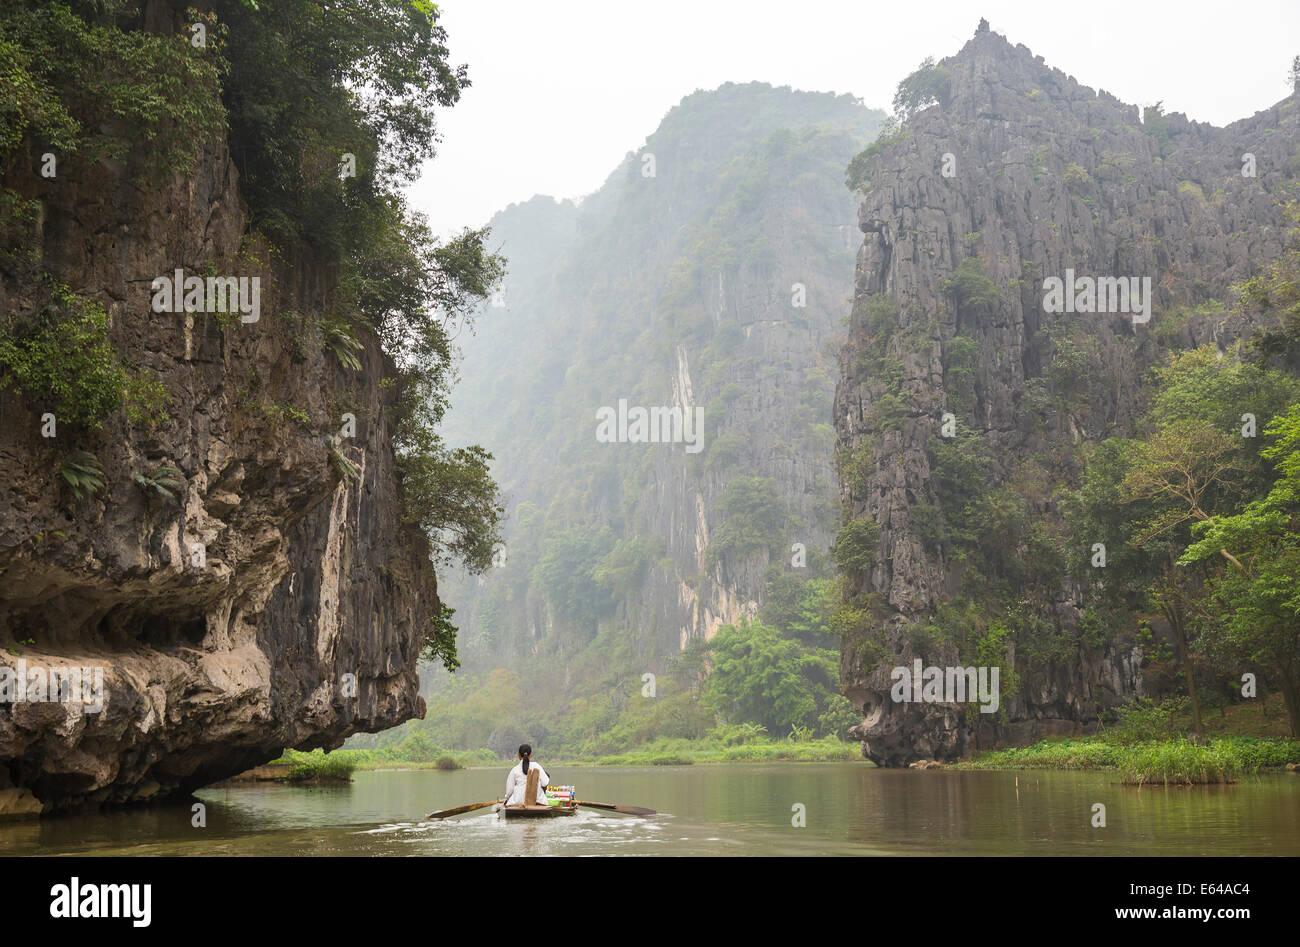 Woman rowing along Ngo Dong River, Tam Coc nr Ninh Binh, nr Hanoi, Vietnam - Stock Image